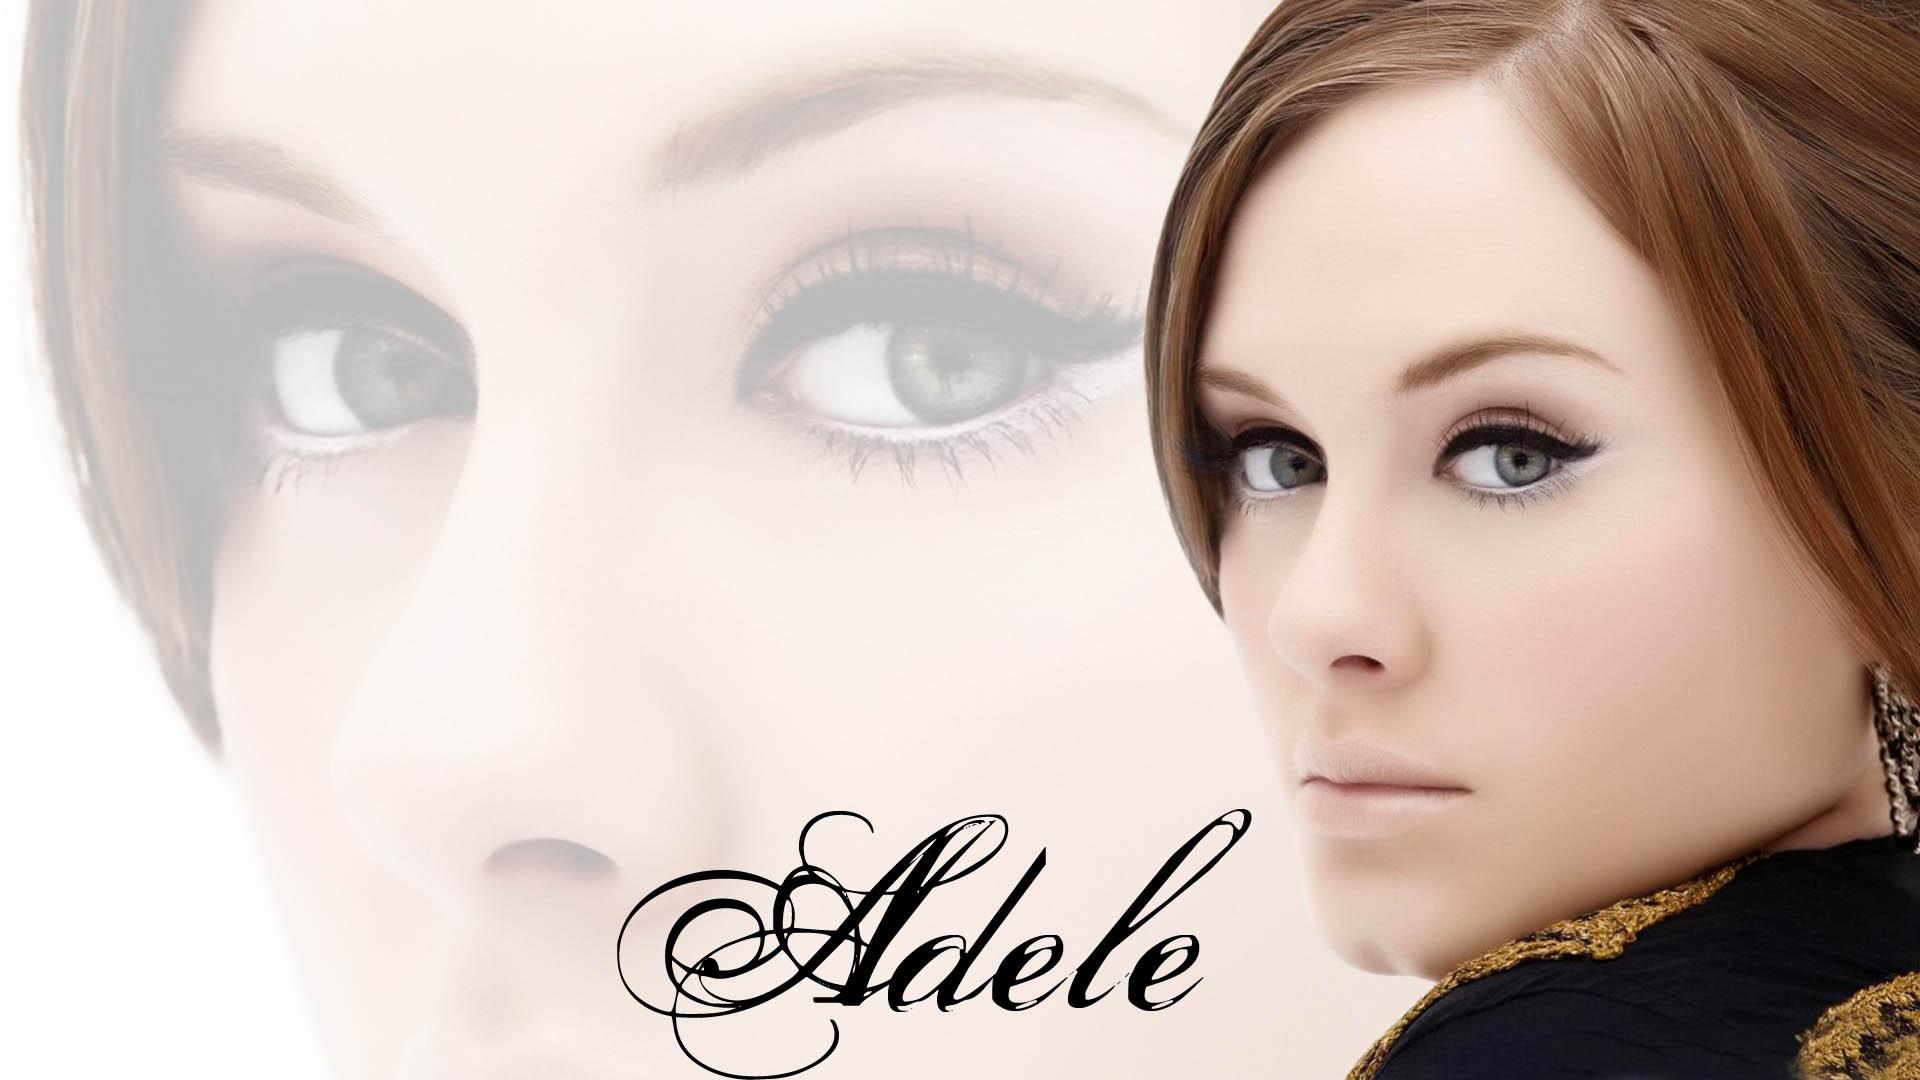 Adele 25 Free Wallpaper